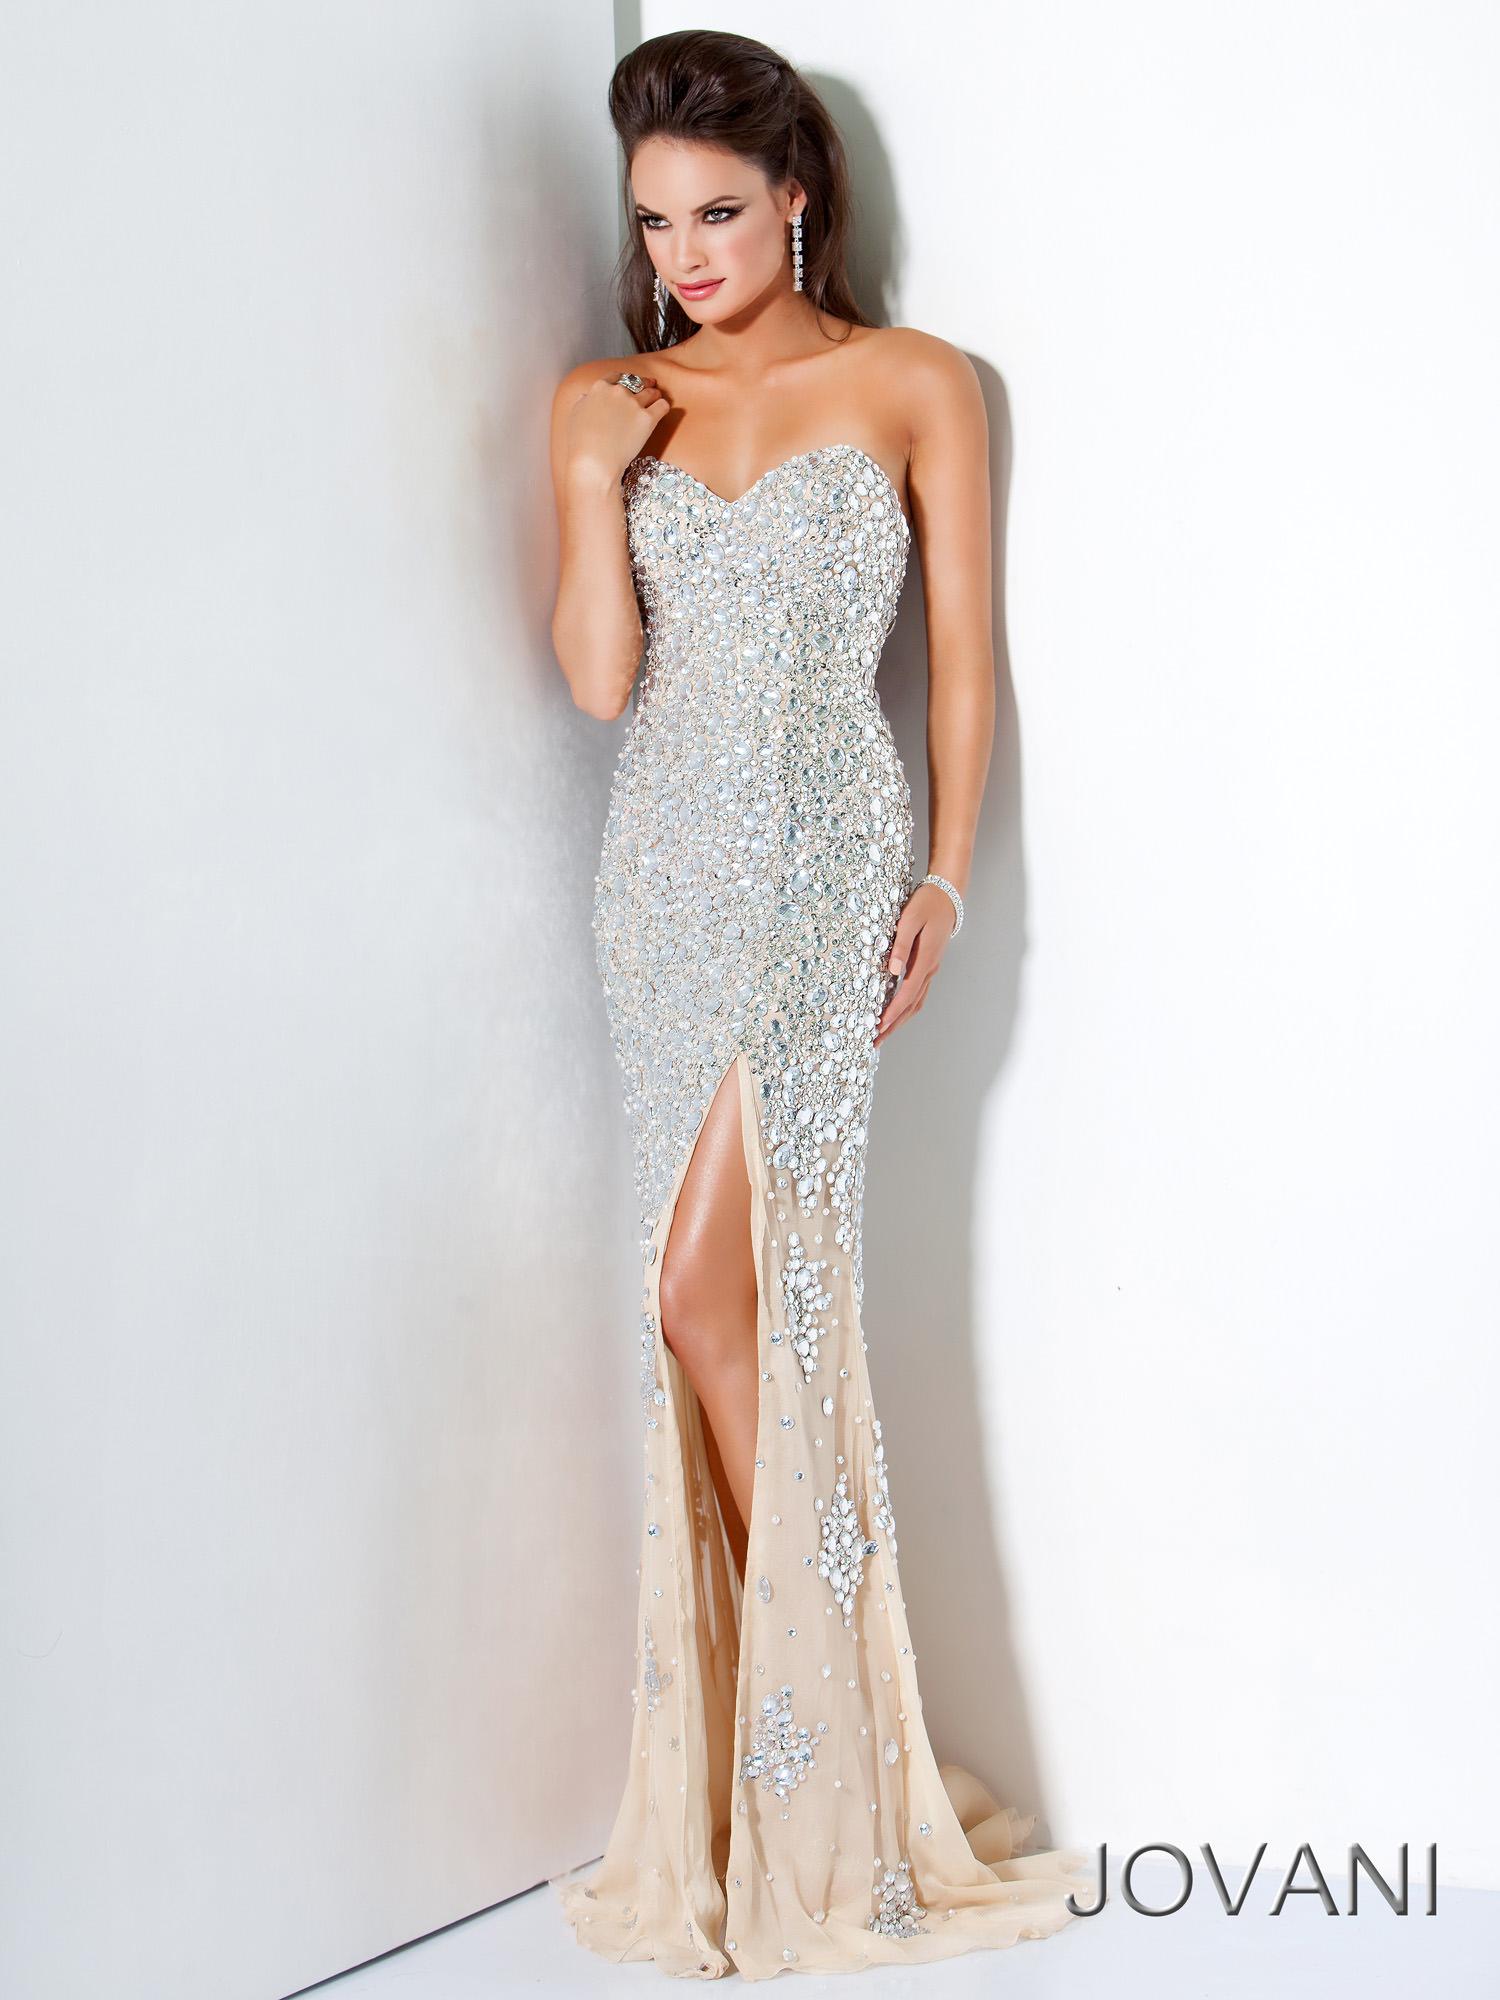 Jovani 4247 beaded evening gown